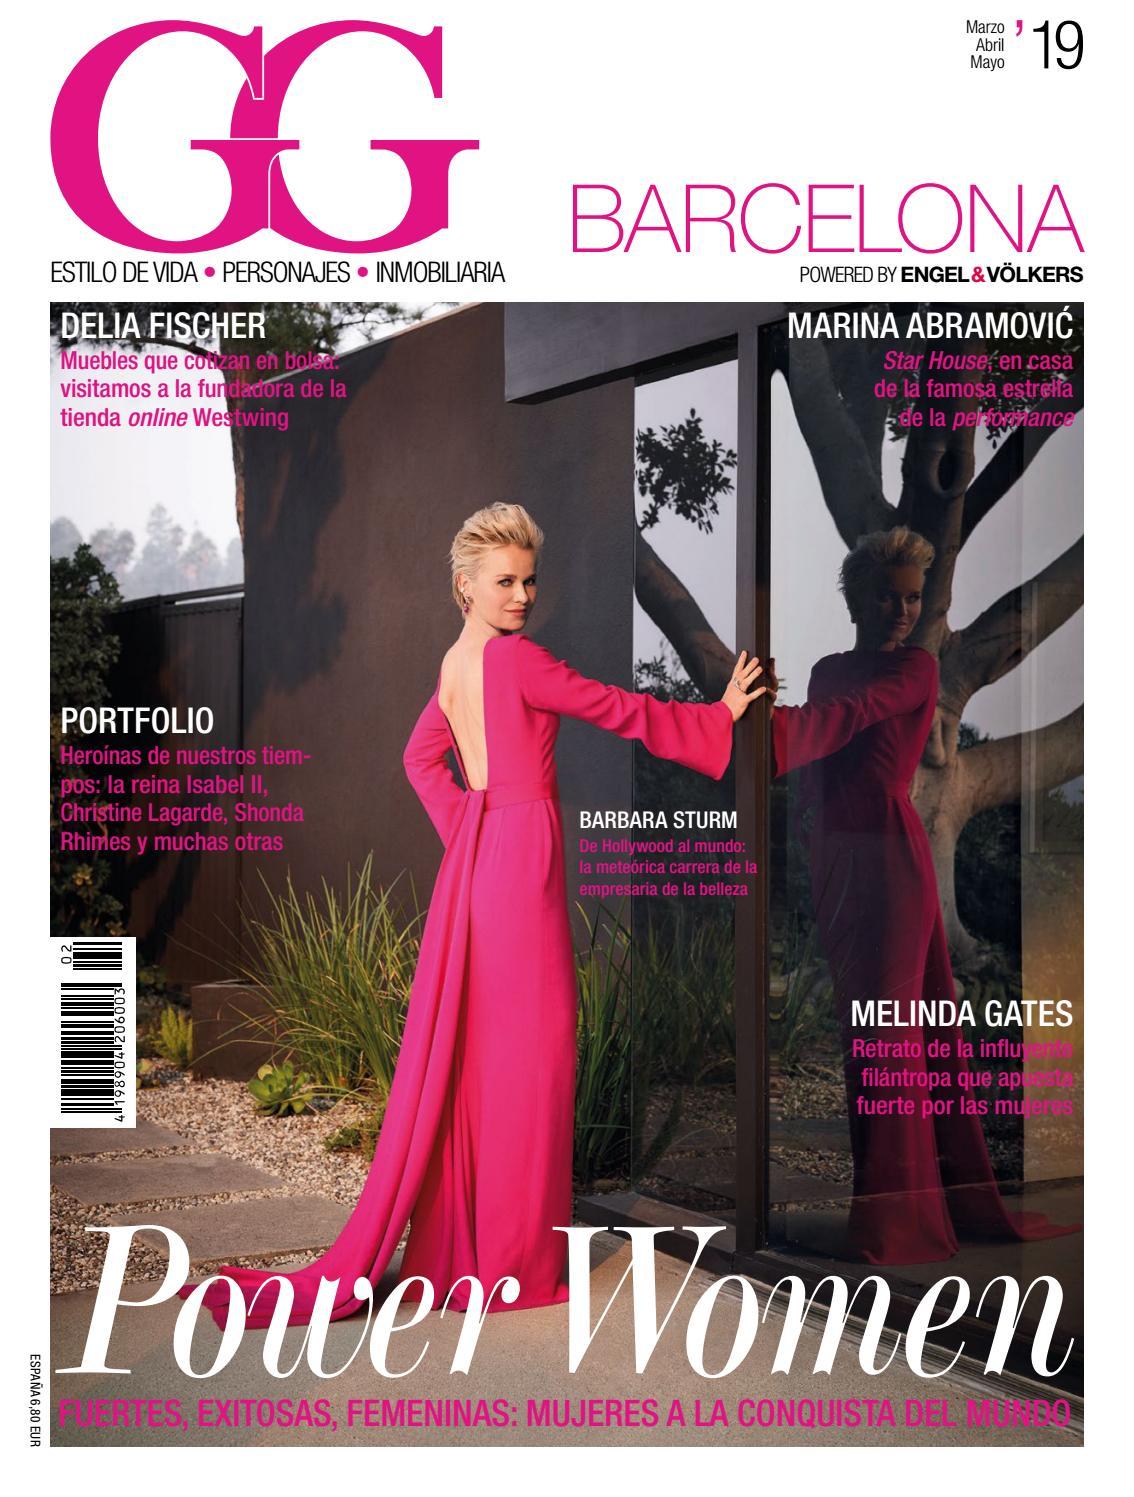 c7565cfa4 GG Magazine 02 19 Barcelona by GG-Magazine - issuu